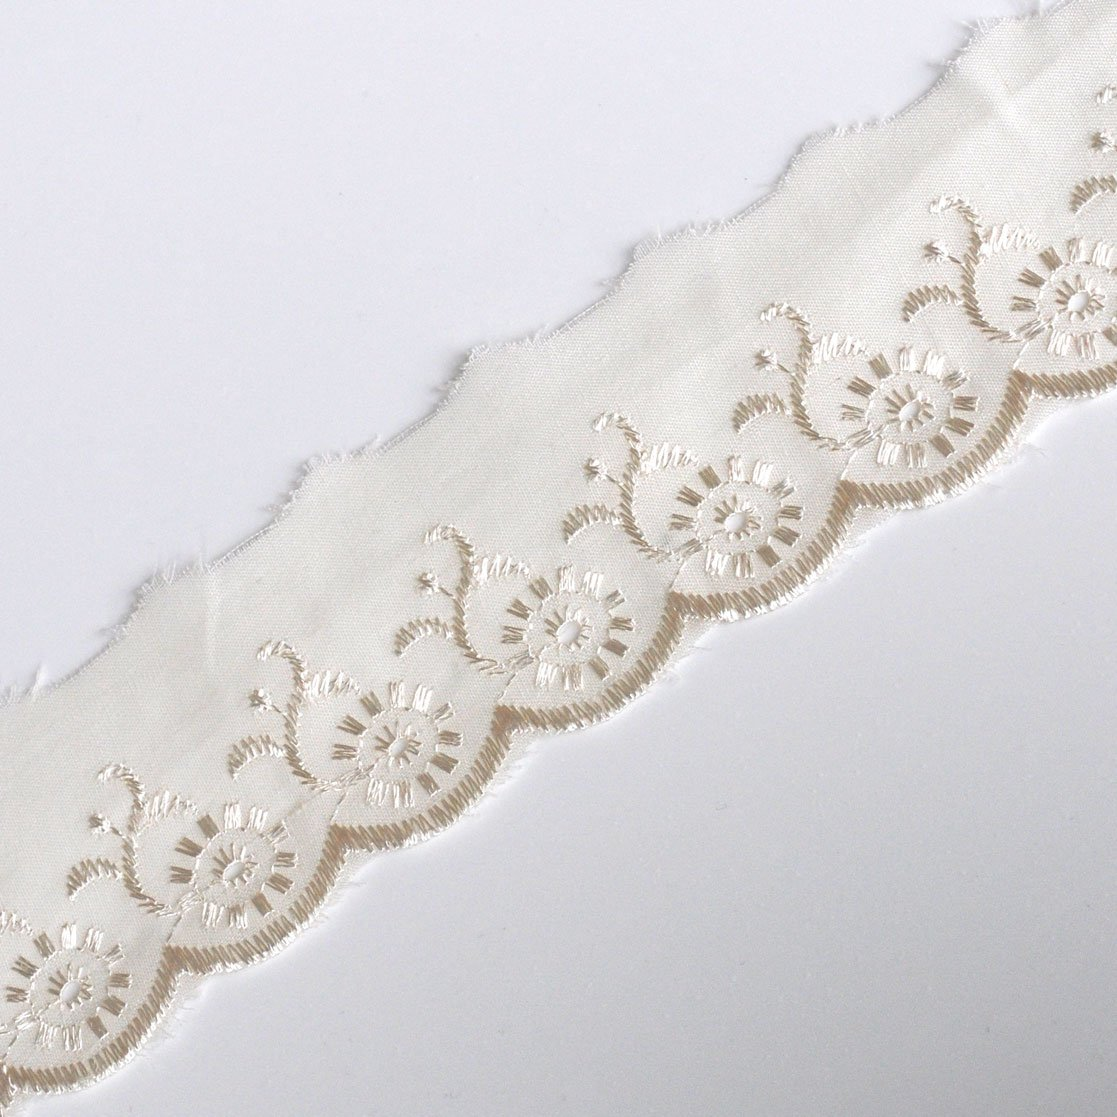 Plush Addict Broderie Anglaise Scalloped Lace Trim 50mm Wide Per Metre Cream